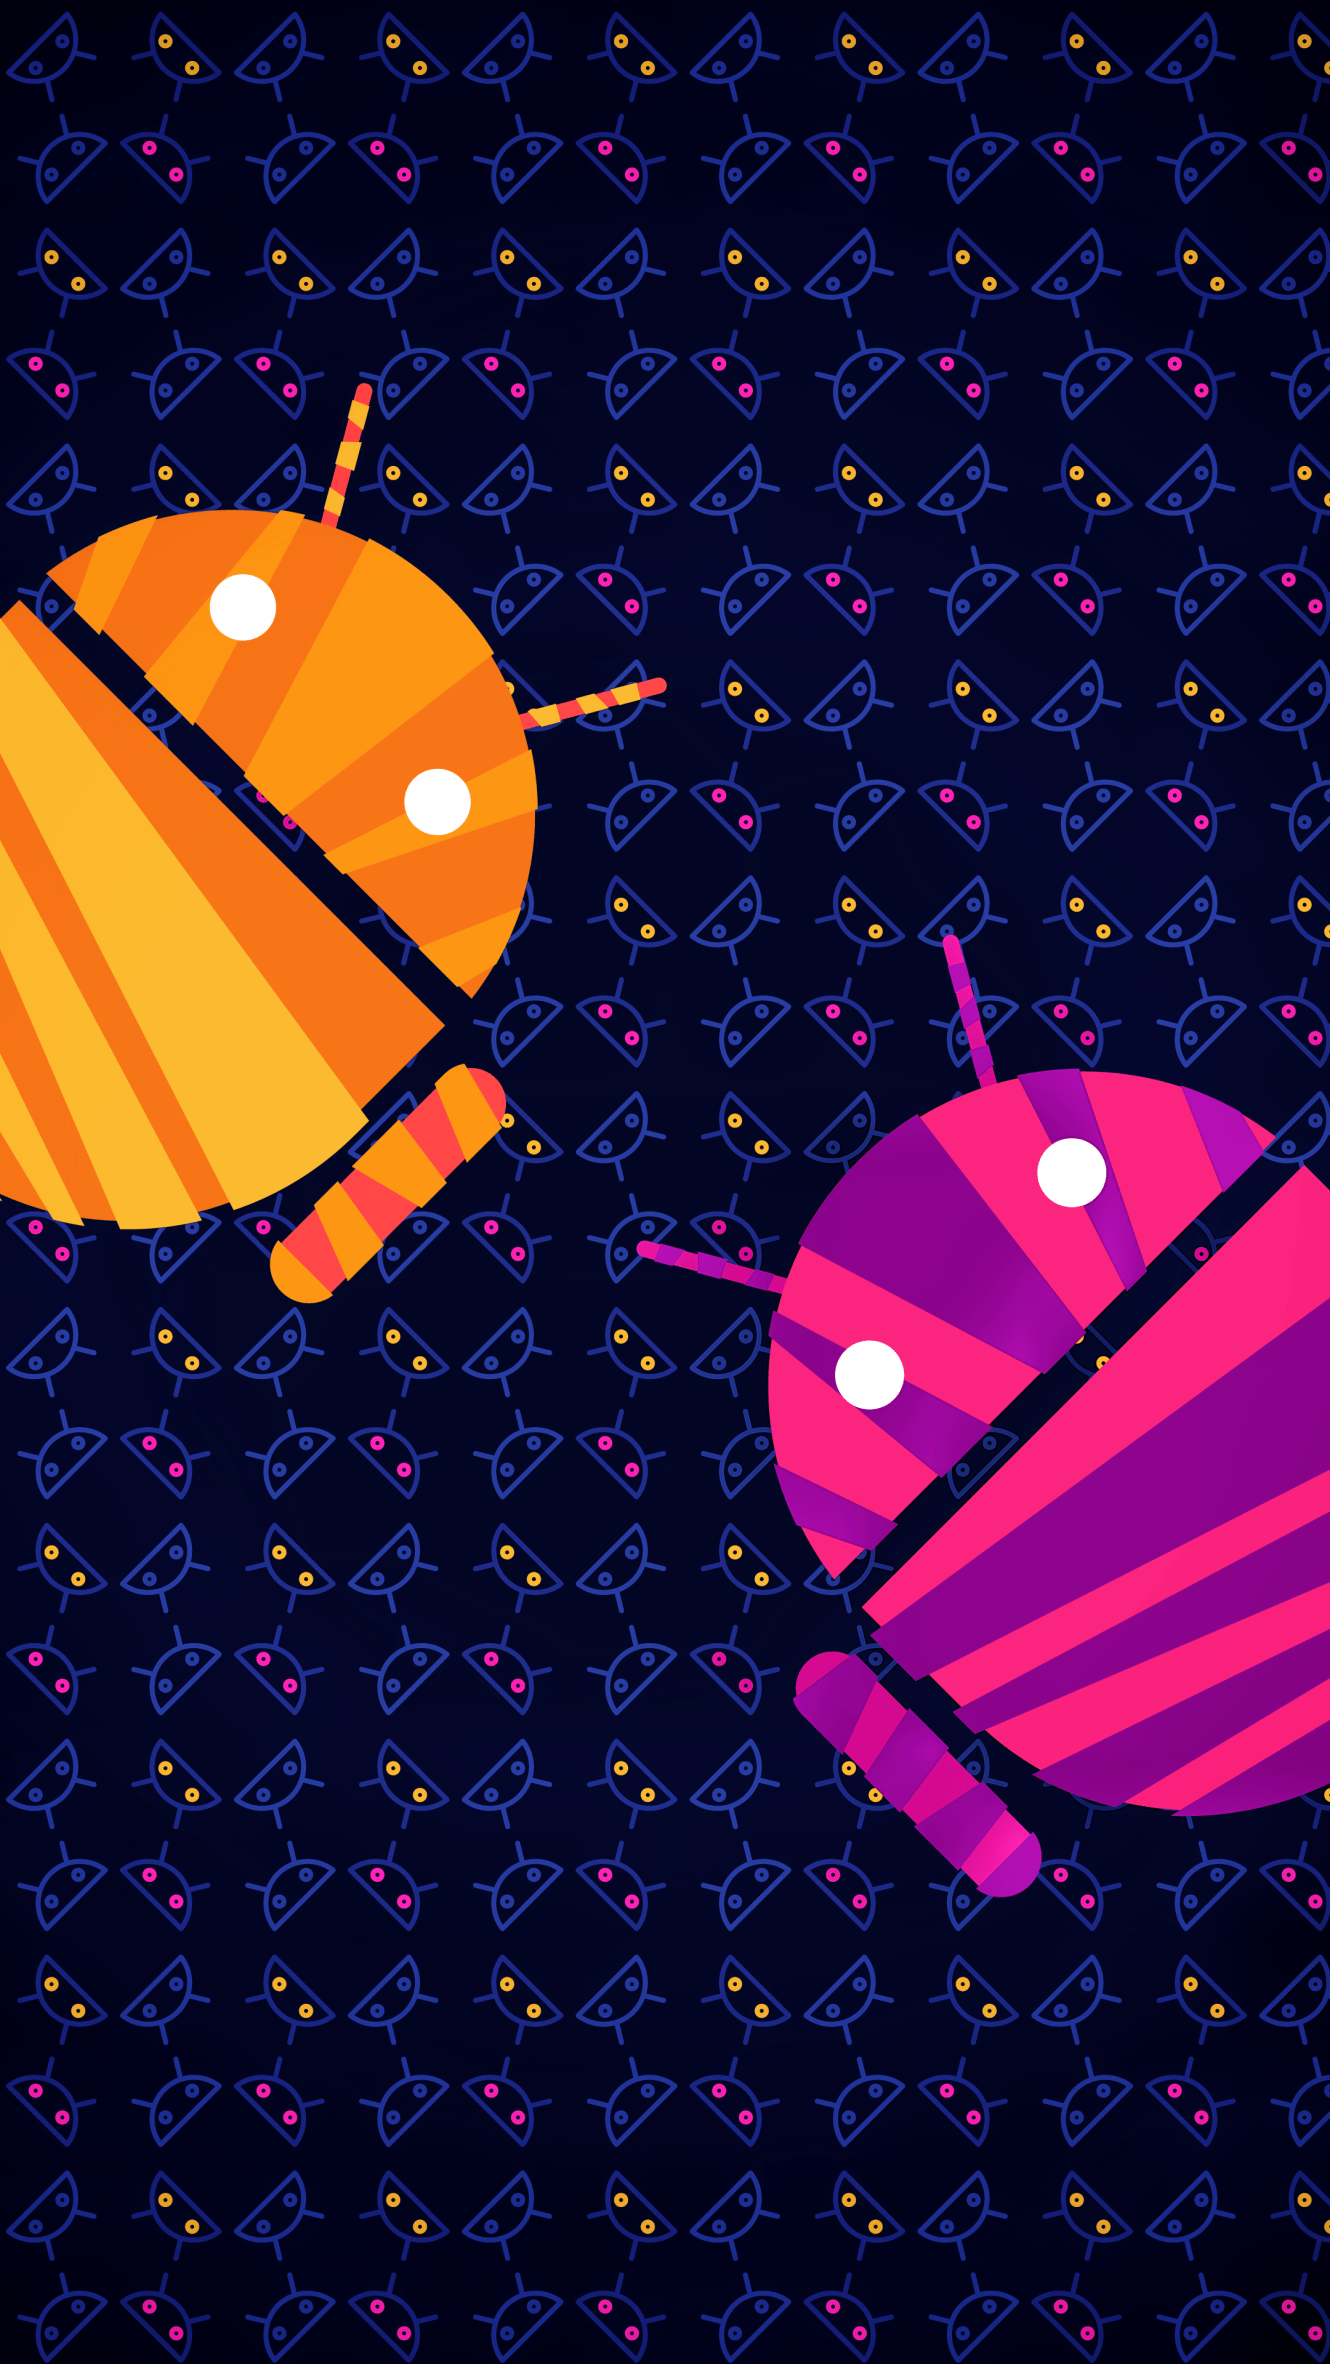 Fondos De Pantalla Chidos Para Celular 4k Gratis Fondos De Pantalla Chidos Fondo De Pantalla De Android Fondos De Colores